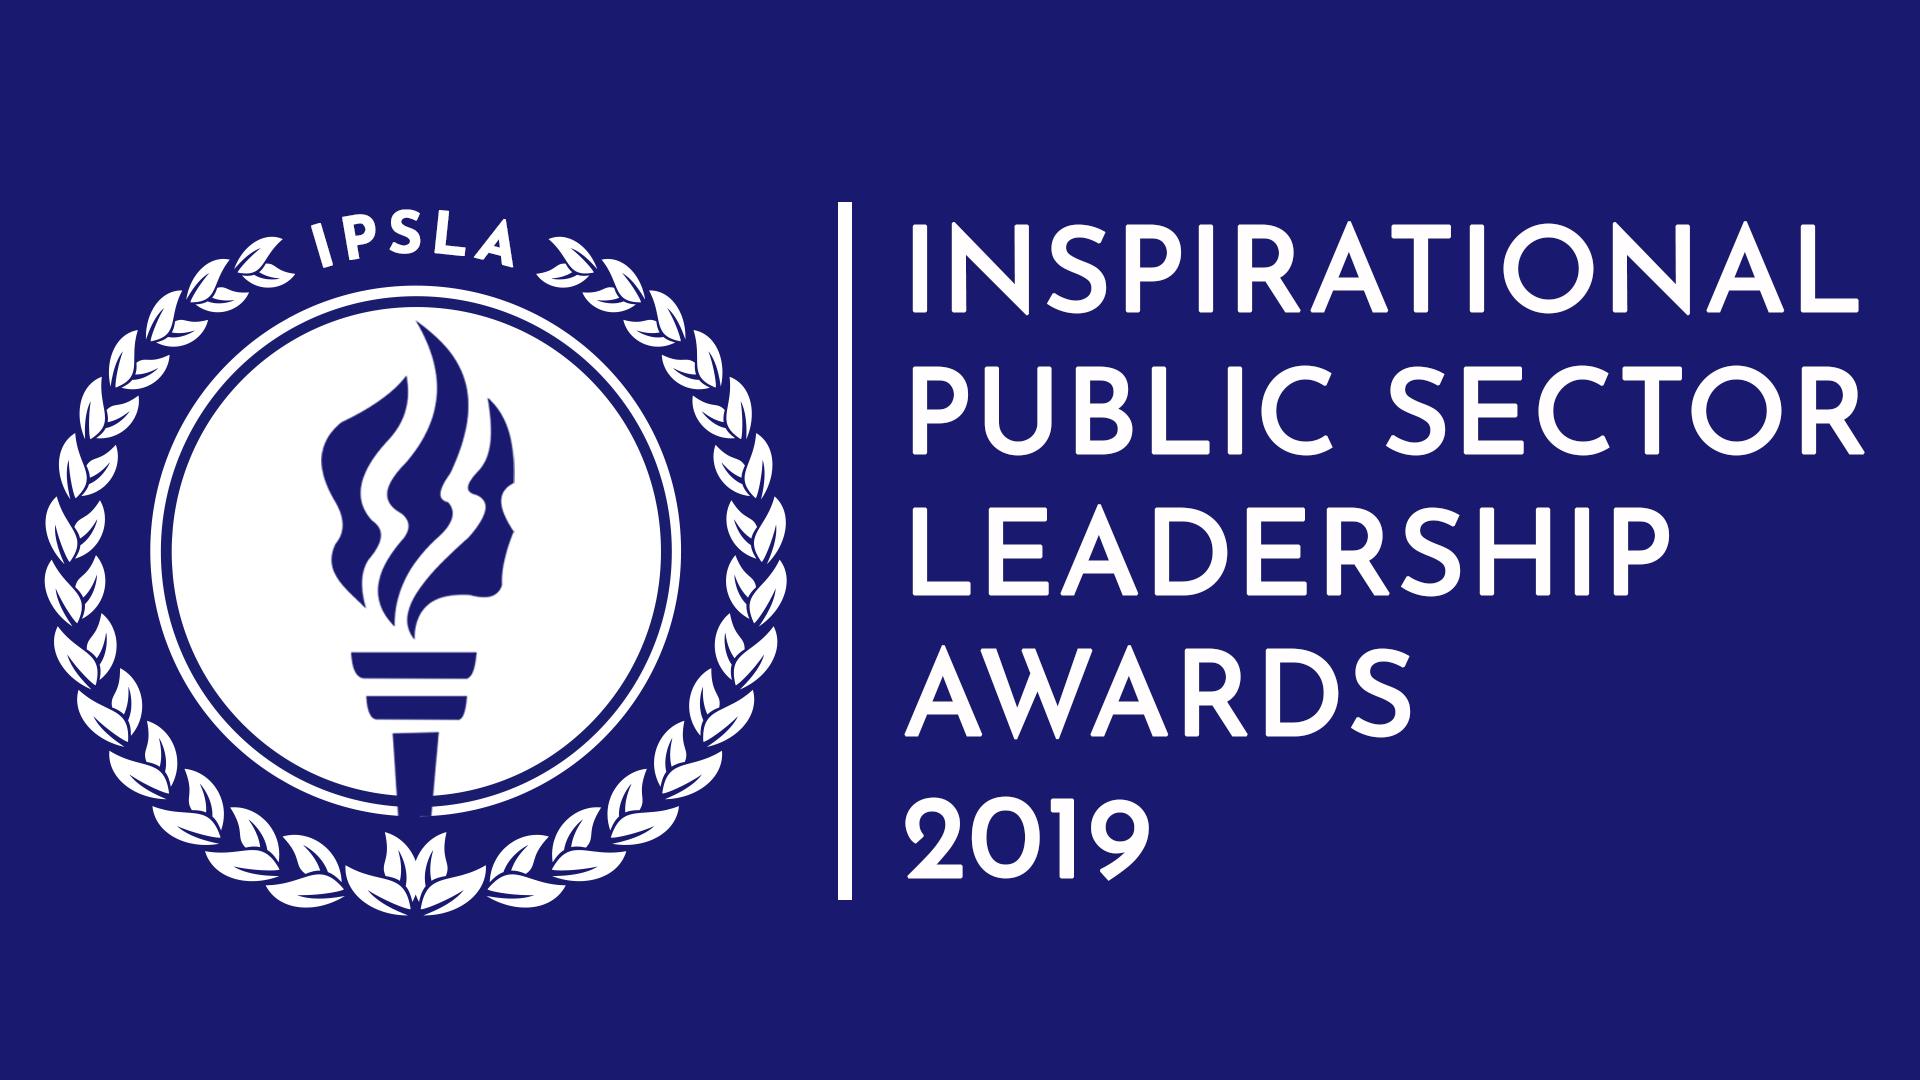 INSPIRATIONAL PUBLIC SECTOR LEADERSHIP AWARDS (IPSLA) -2019